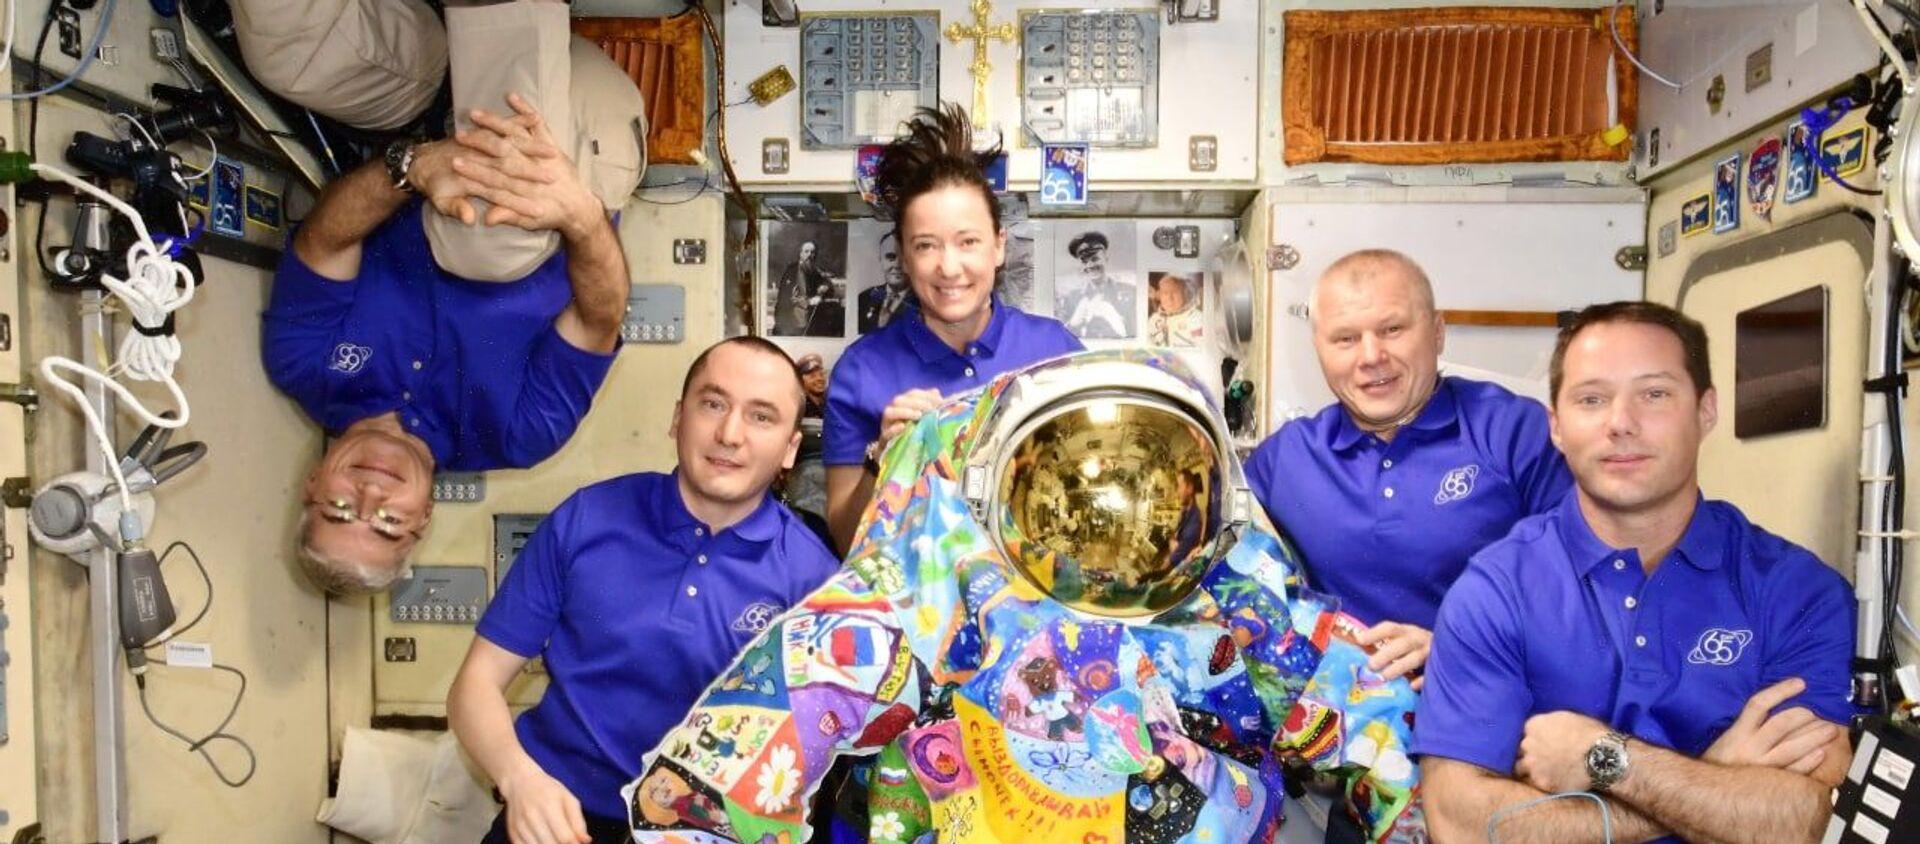 ISS crew - Sputnik International, 1920, 19.07.2021